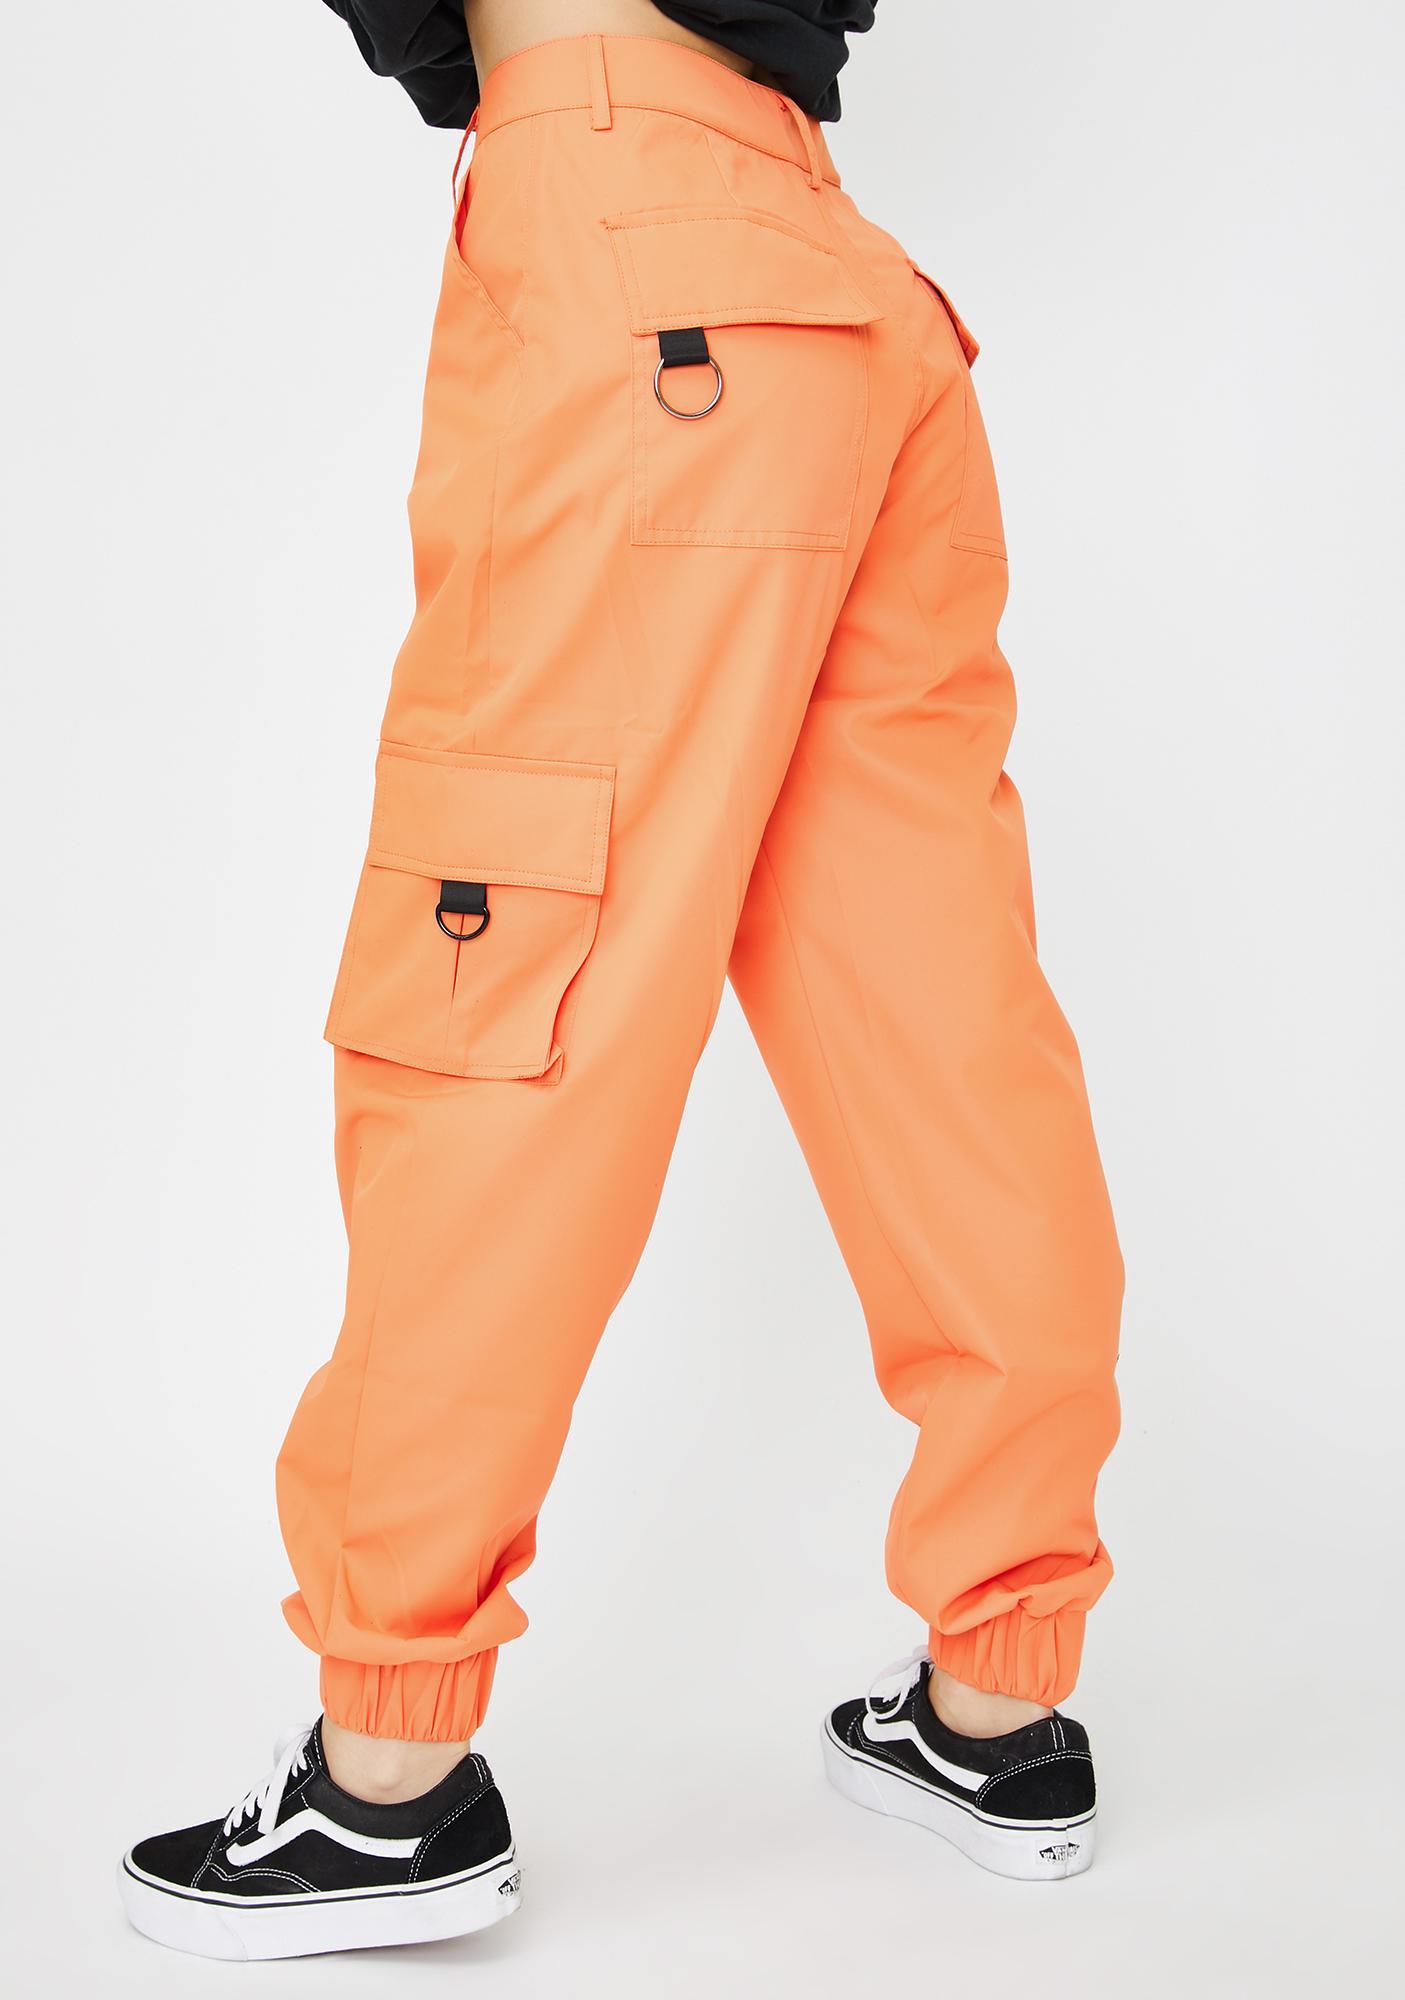 Nana Judy Orange Matira Cargo Pants